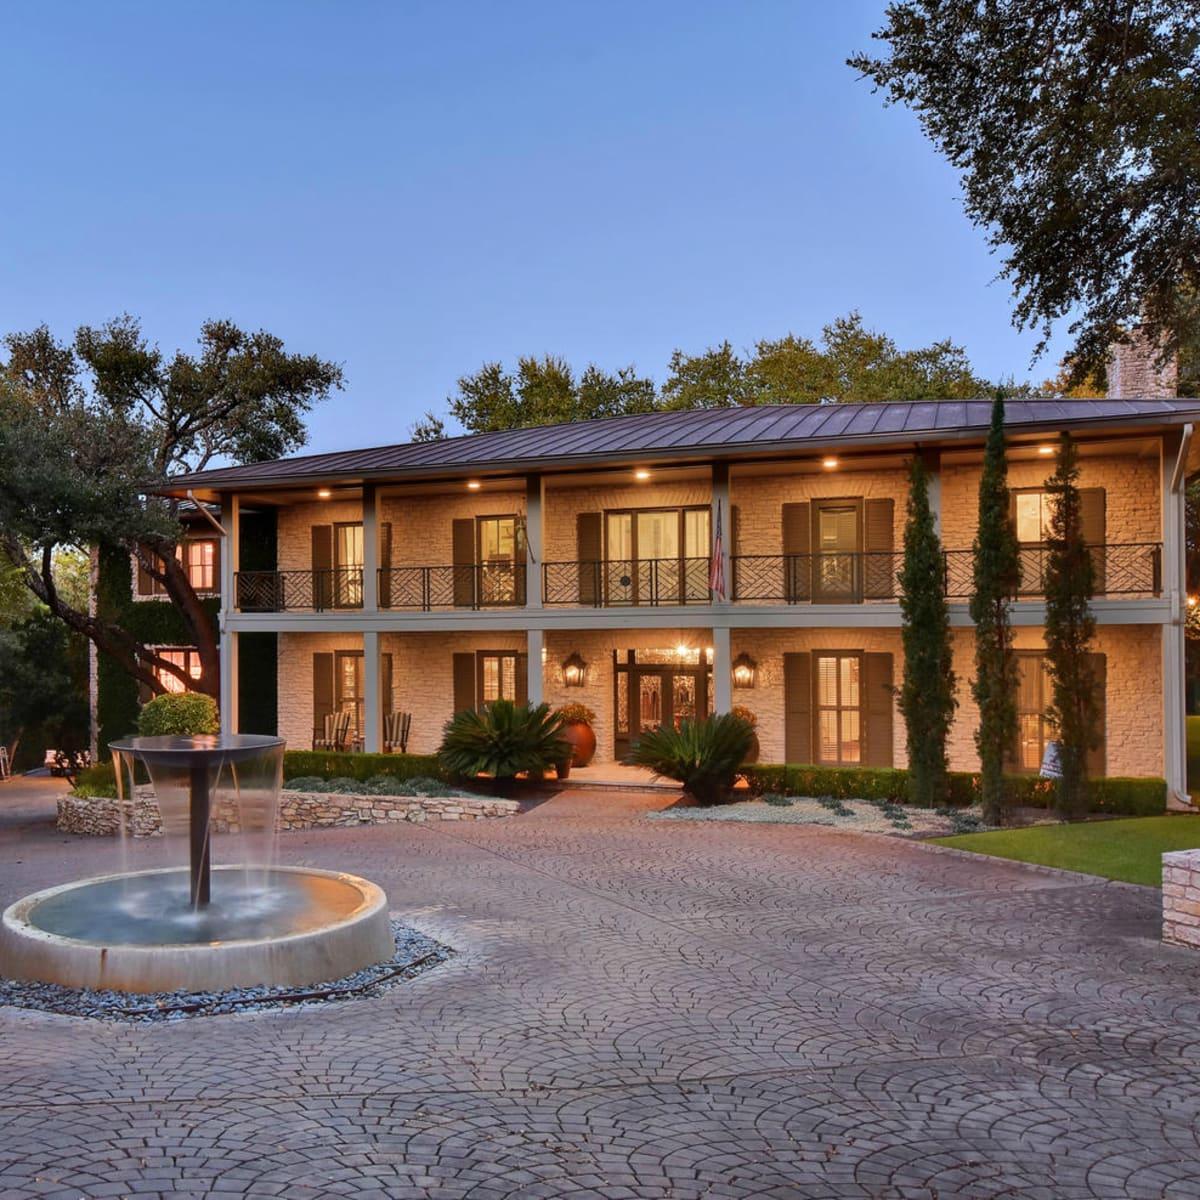 Austin house home Tarrytown 2610 Kenmore Court Ben Crenshaw February 2016 front twilight